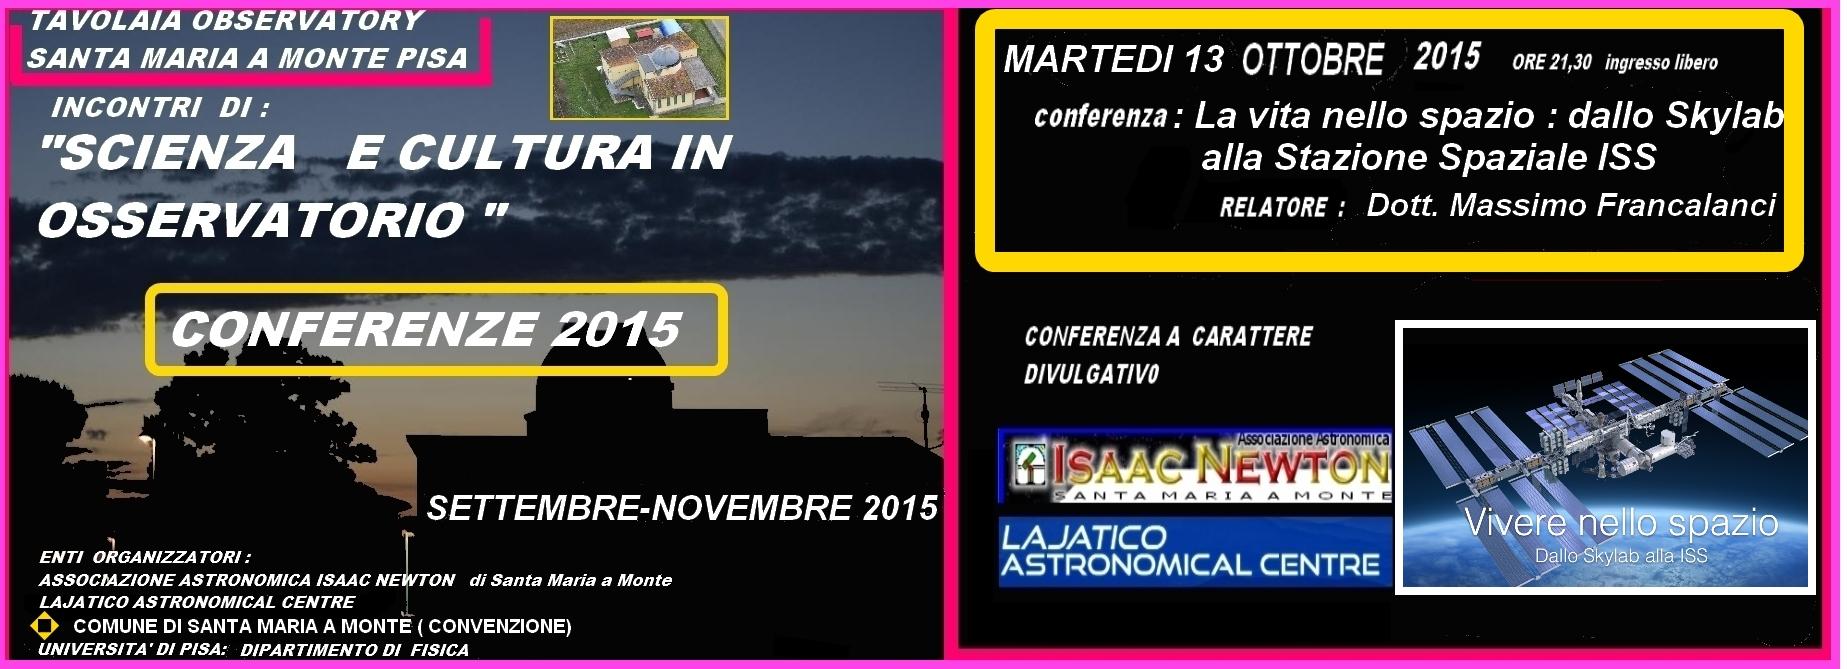 locandina_facebook_-francalanci-_13_0ttobre.jpg